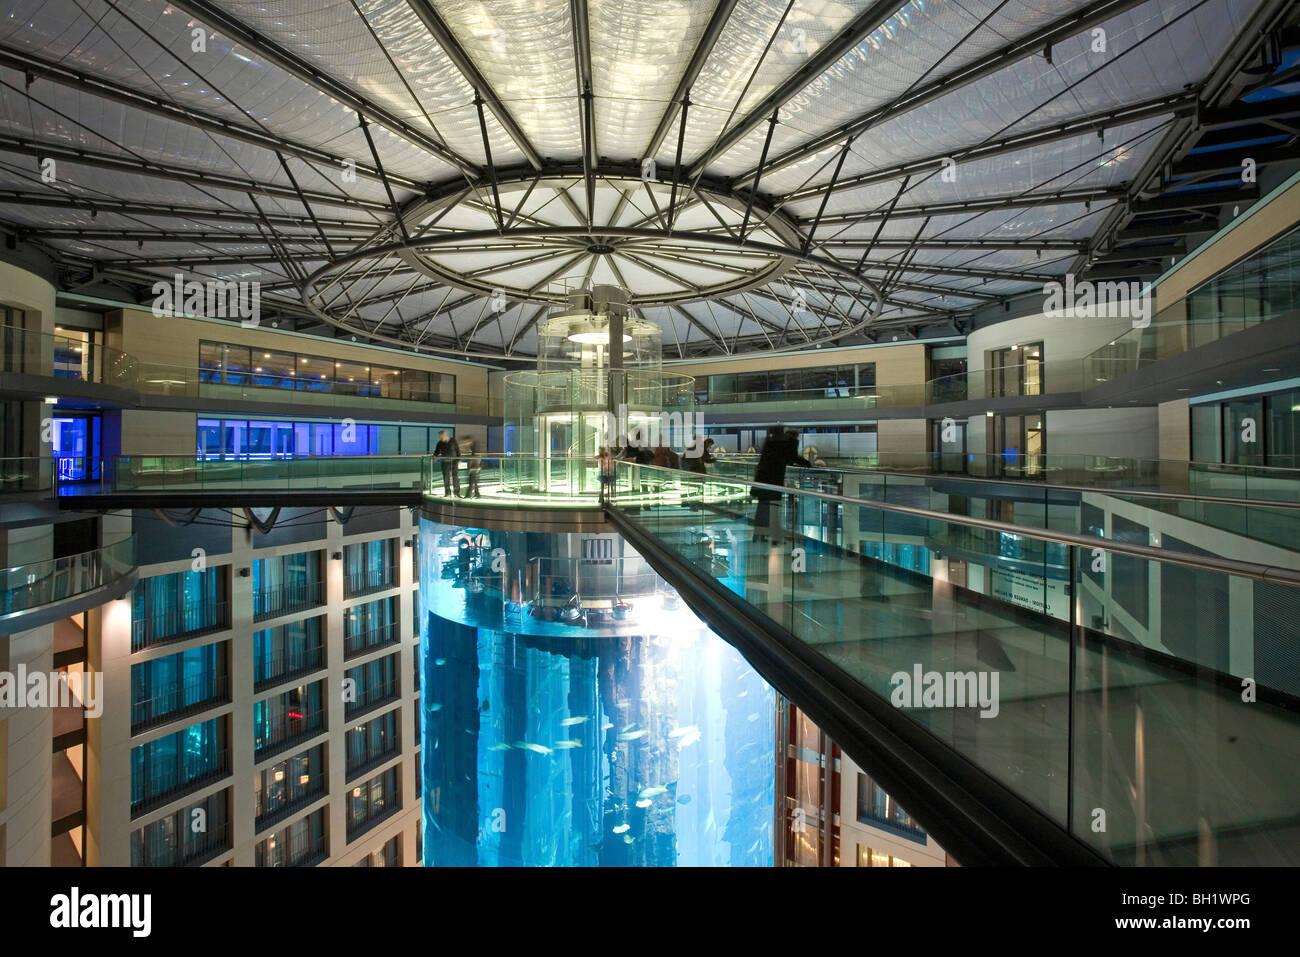 Radisson Blu Hotel Hamburg Germany